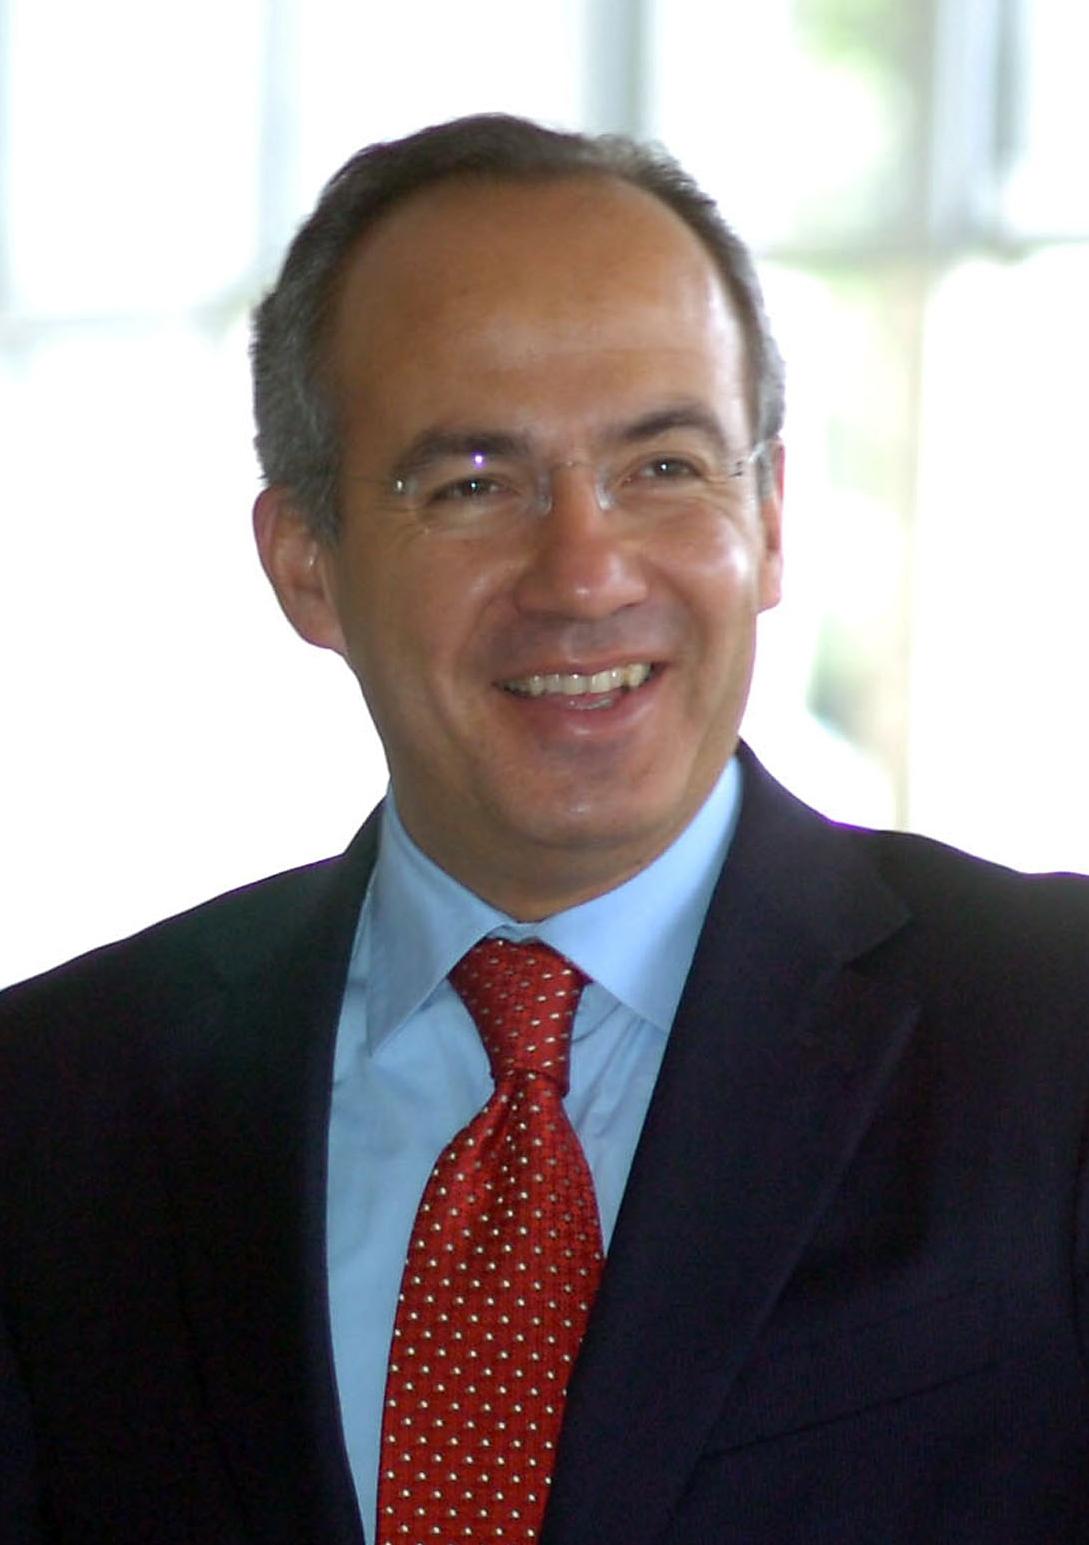 File:Felipe Calderon H.jpg - Wikimedia Commons Felipe